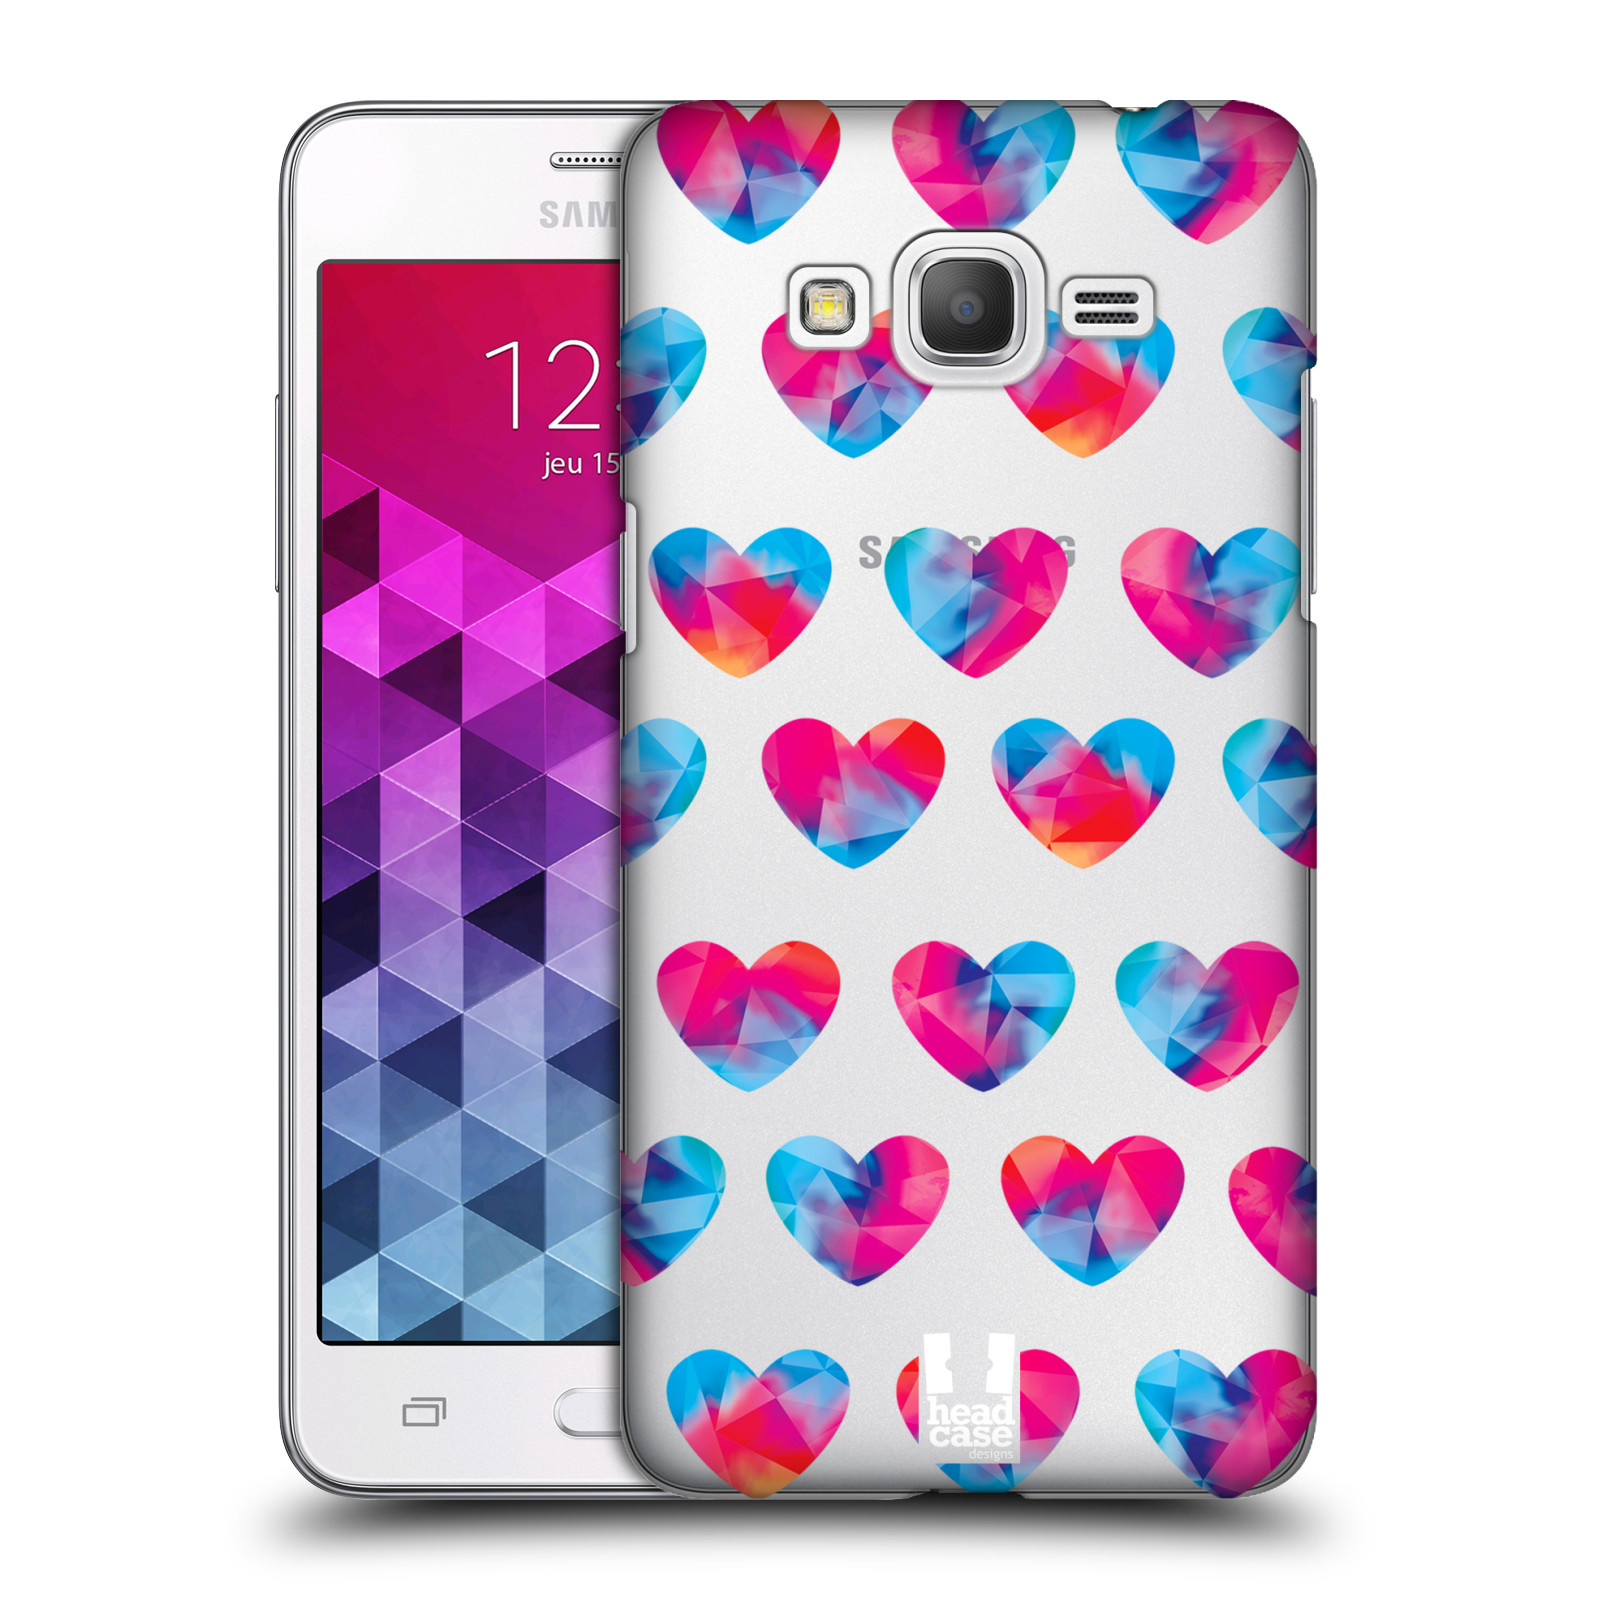 Plastové pouzdro na mobil Samsung Galaxy Grand Prime VE - Head Case - Srdíčka hrající barvami